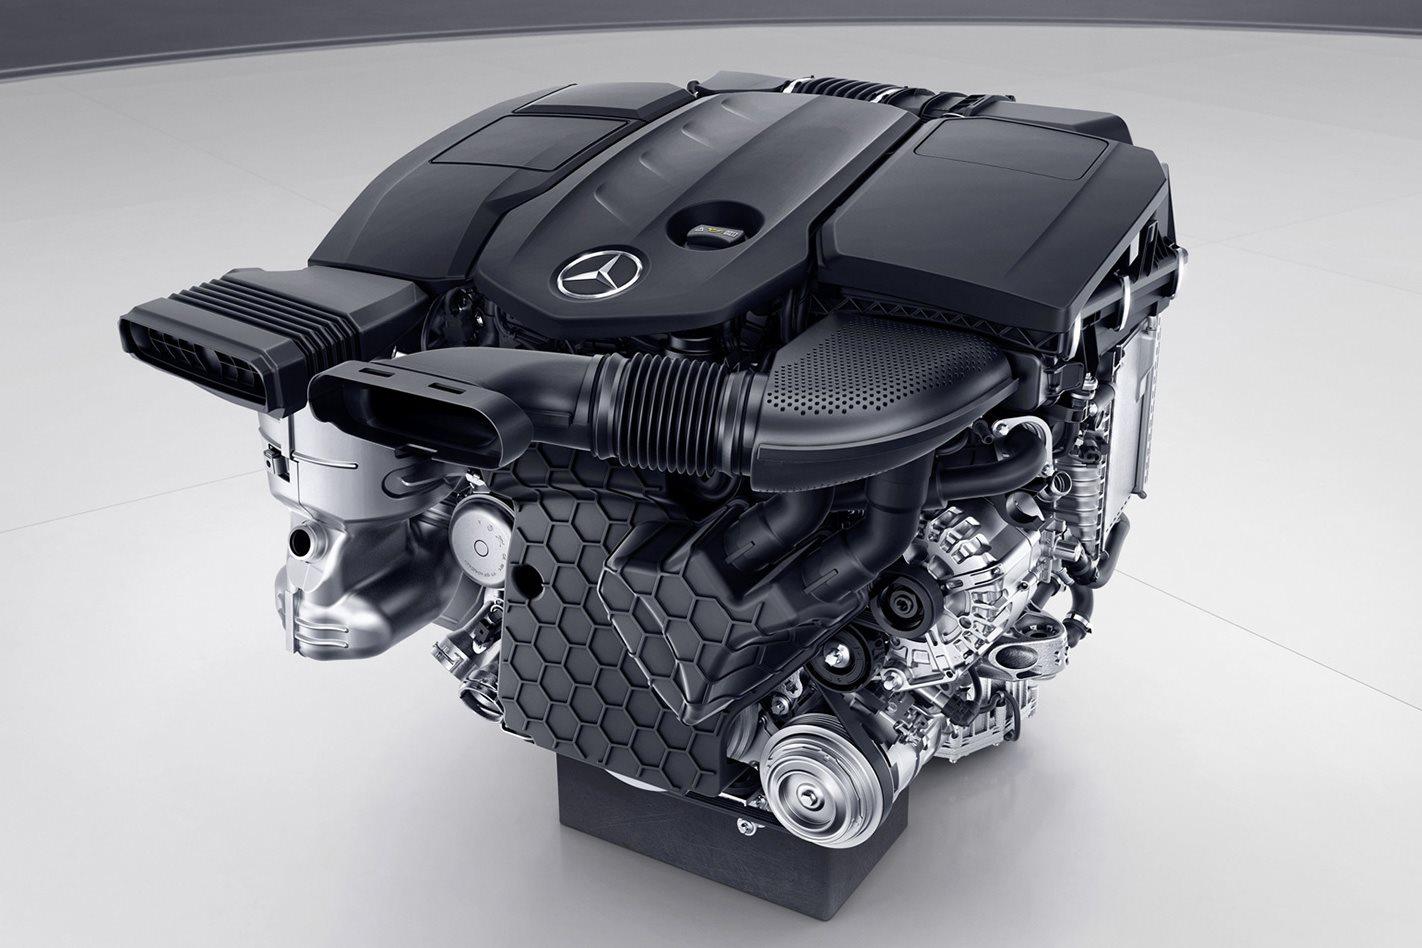 new mercedes benz diesel engine 4x4 australia. Black Bedroom Furniture Sets. Home Design Ideas